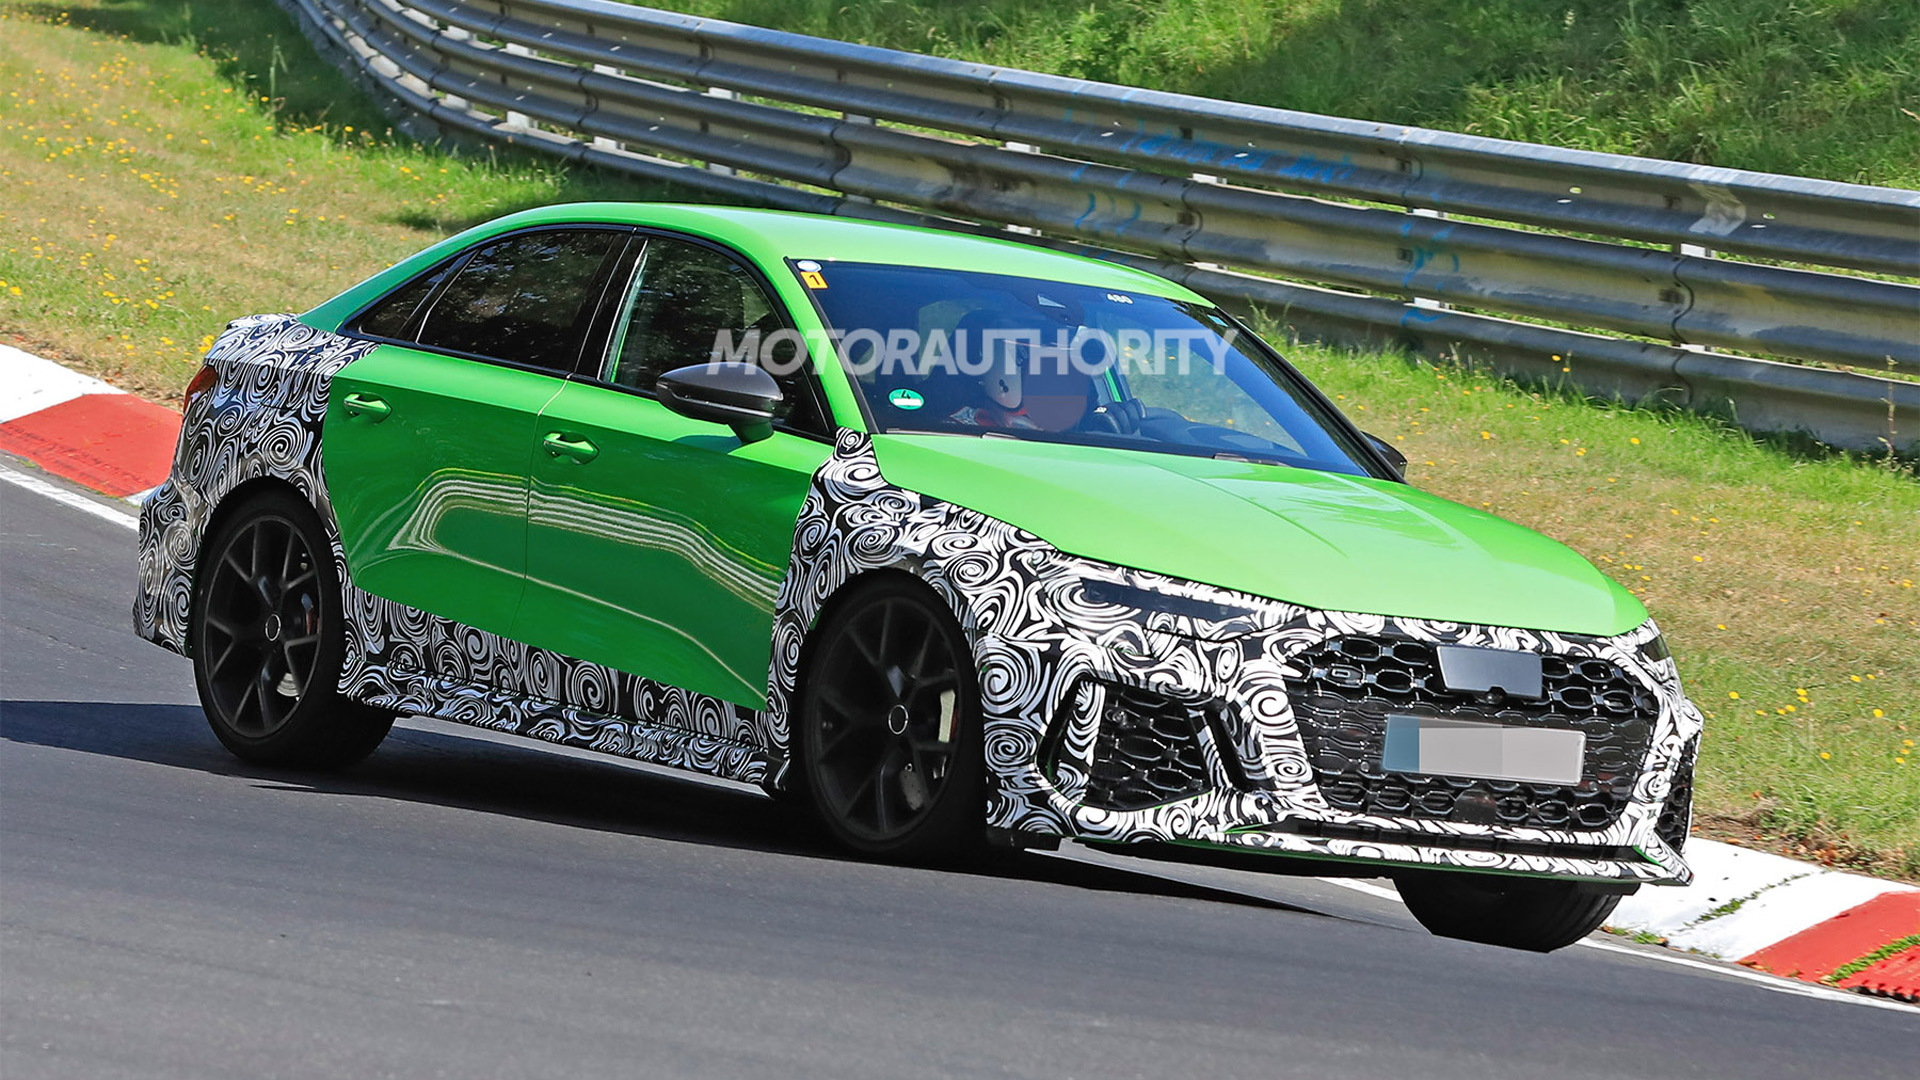 2022 Audi RS 3 Sportback spy shots - Photo credit:S. Baldauf/SB-Medien